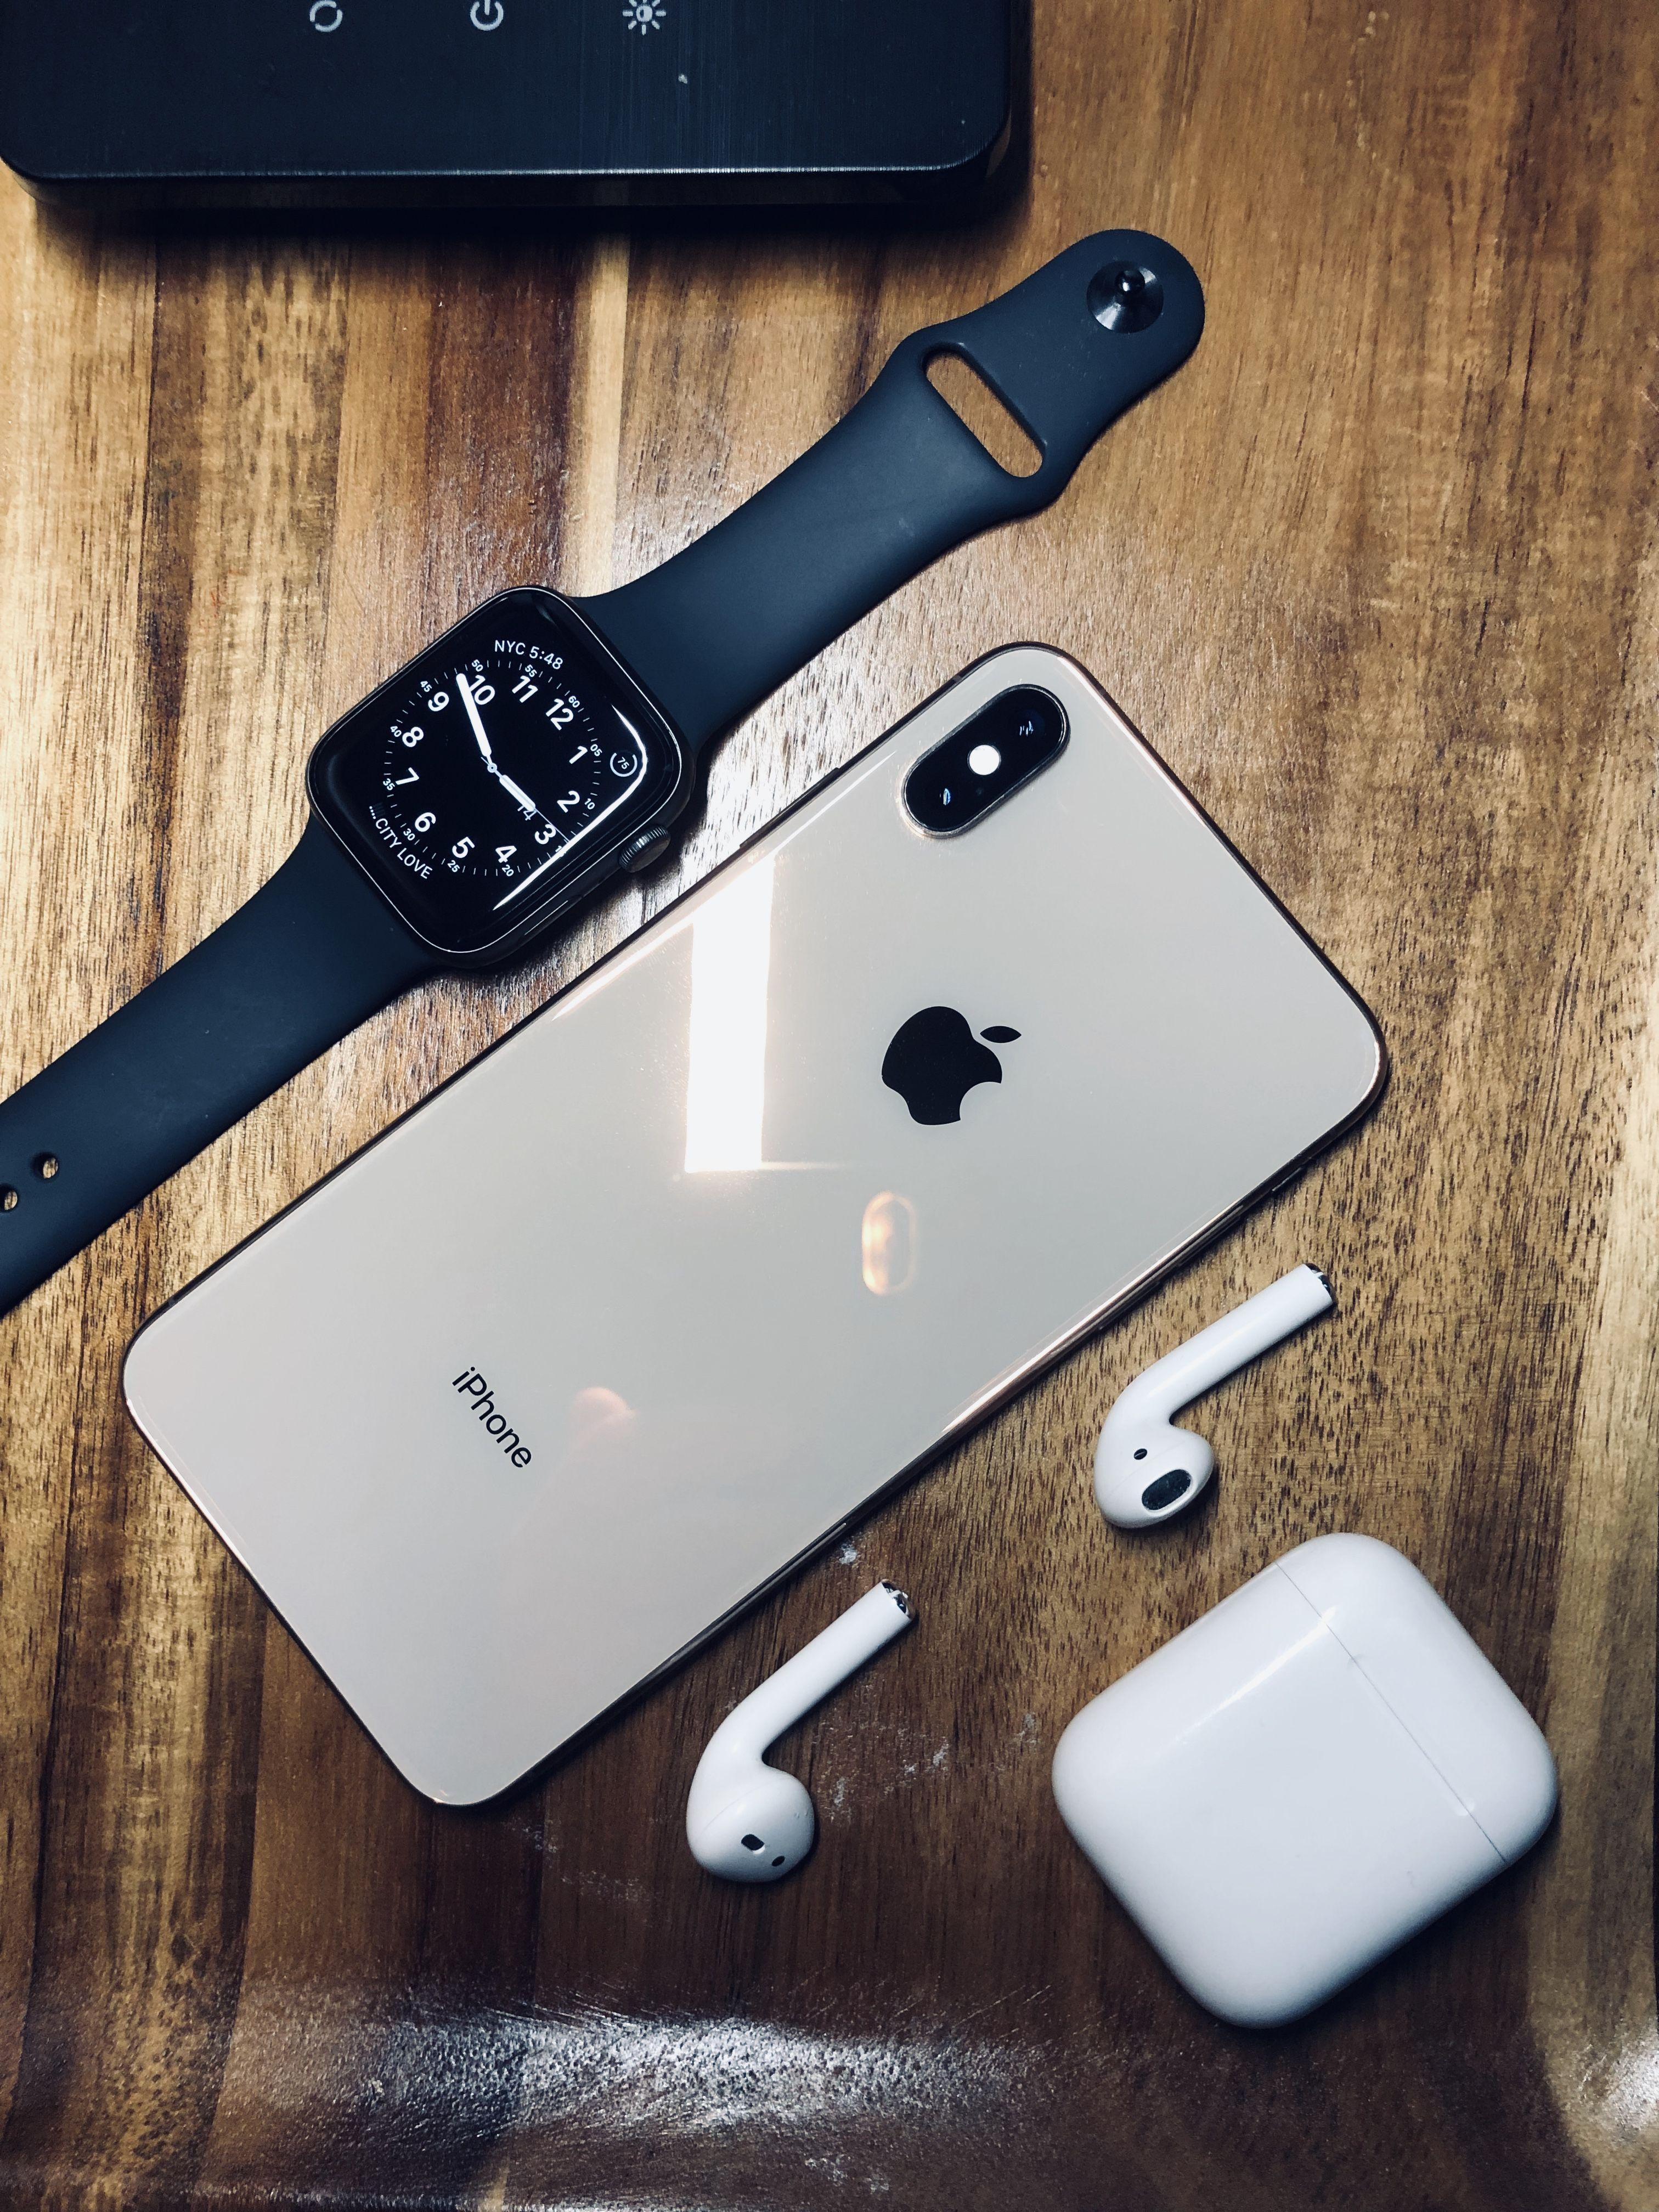 bcb26b0c197f8bfc4839cef32eabbcfd Smartwatch Iphone Xs